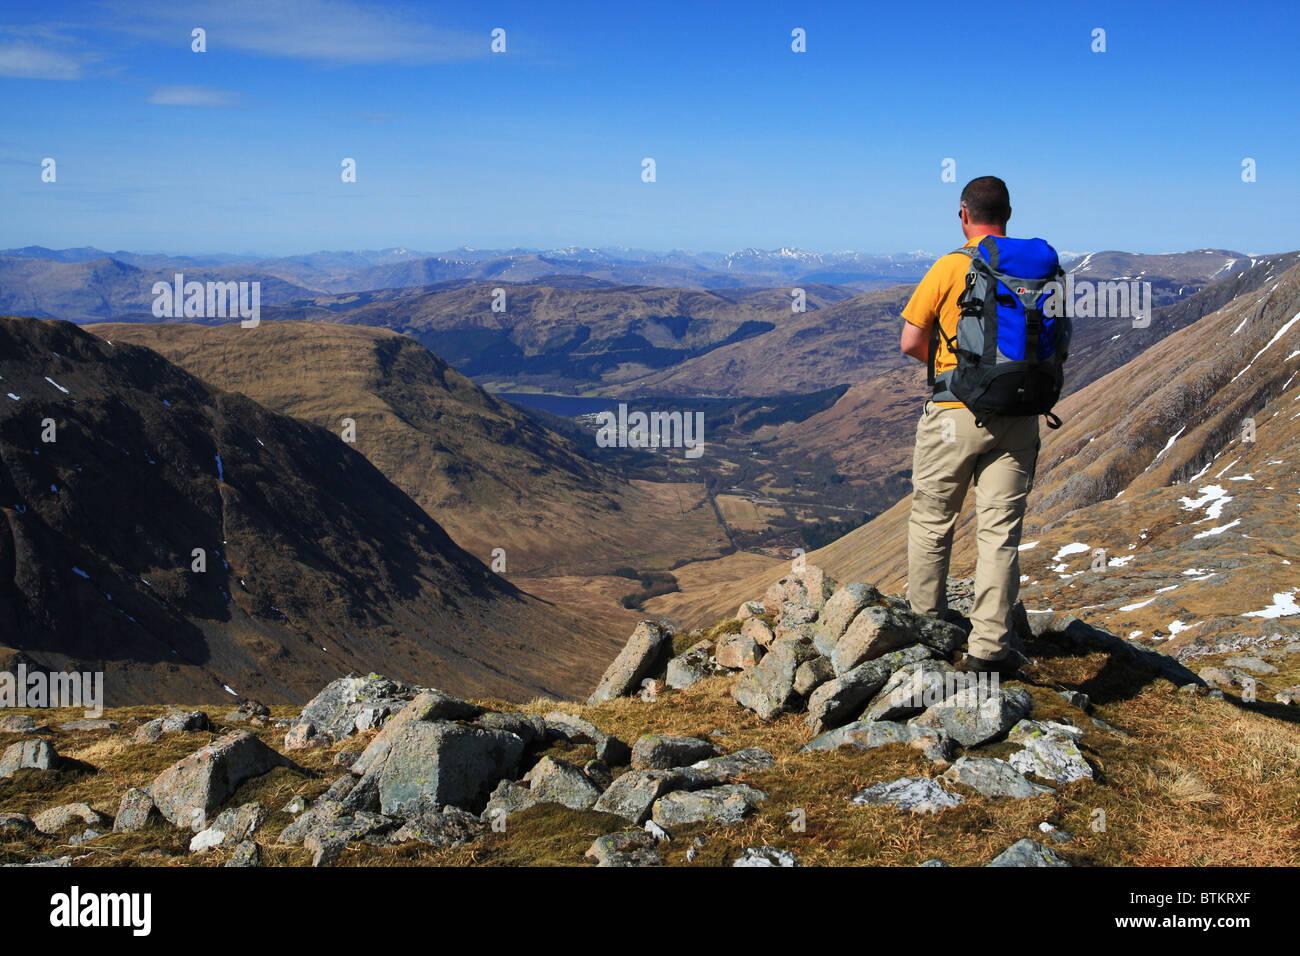 Hillwalker on Beinn Maol Chaluim looking down to the village of Glencoe. - Stock Image